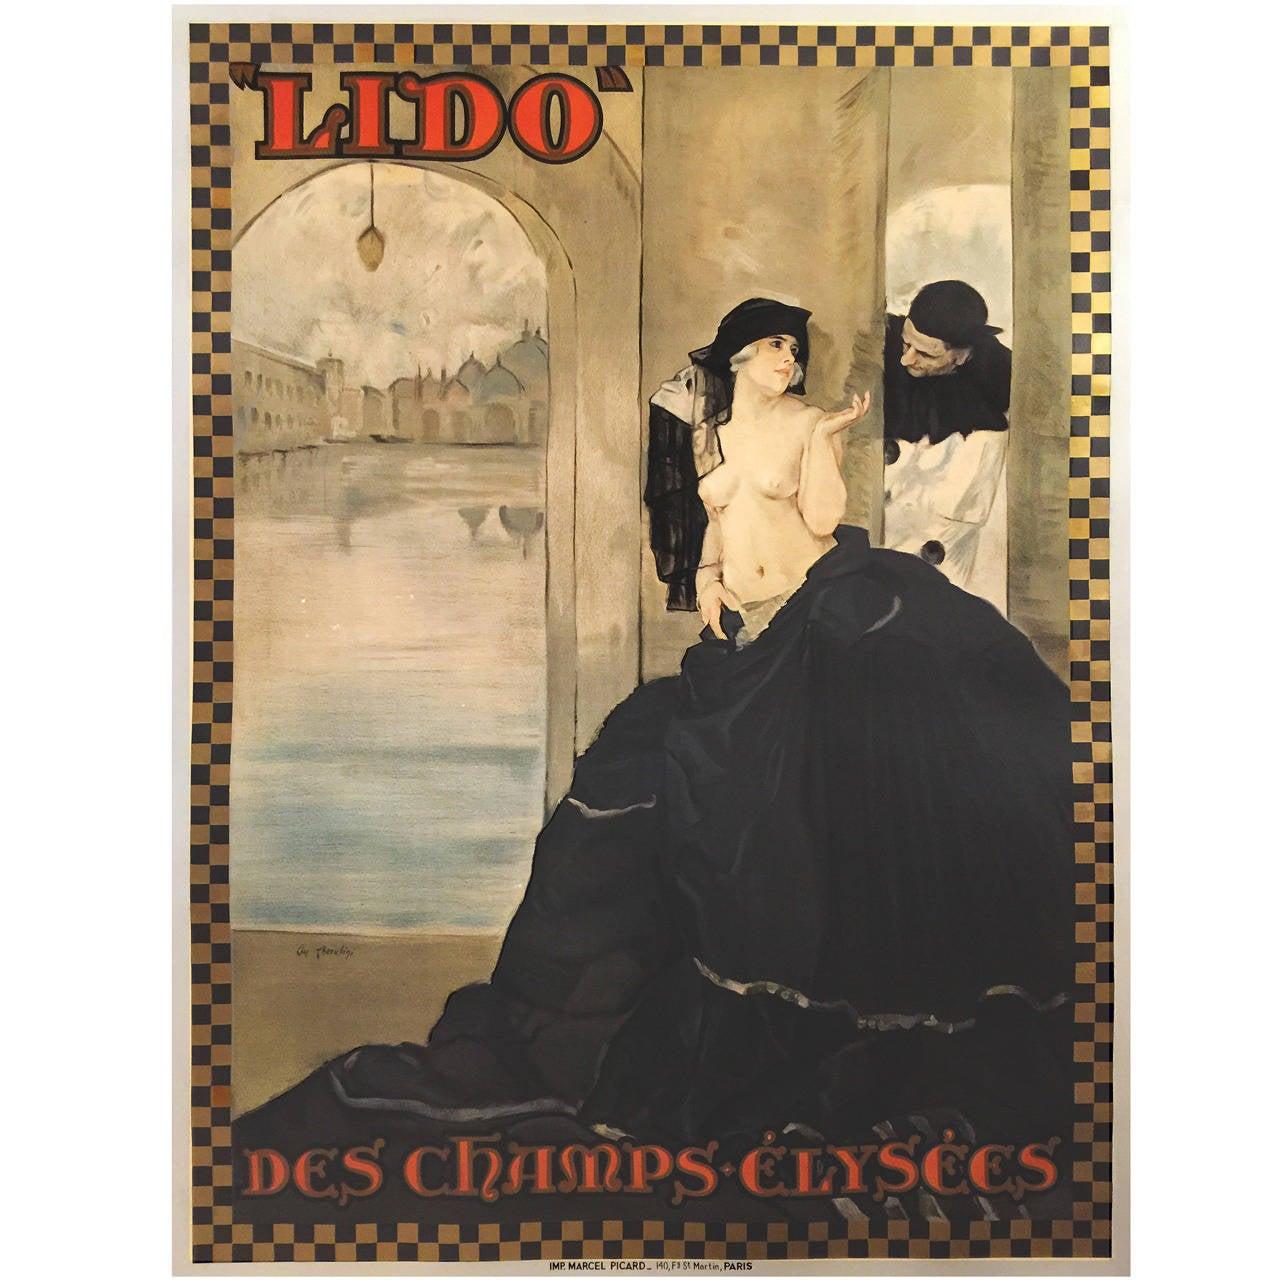 French Art Nouveau Period Poster Le Lido Des Champs-ElyseéS by Carlo Cherubini